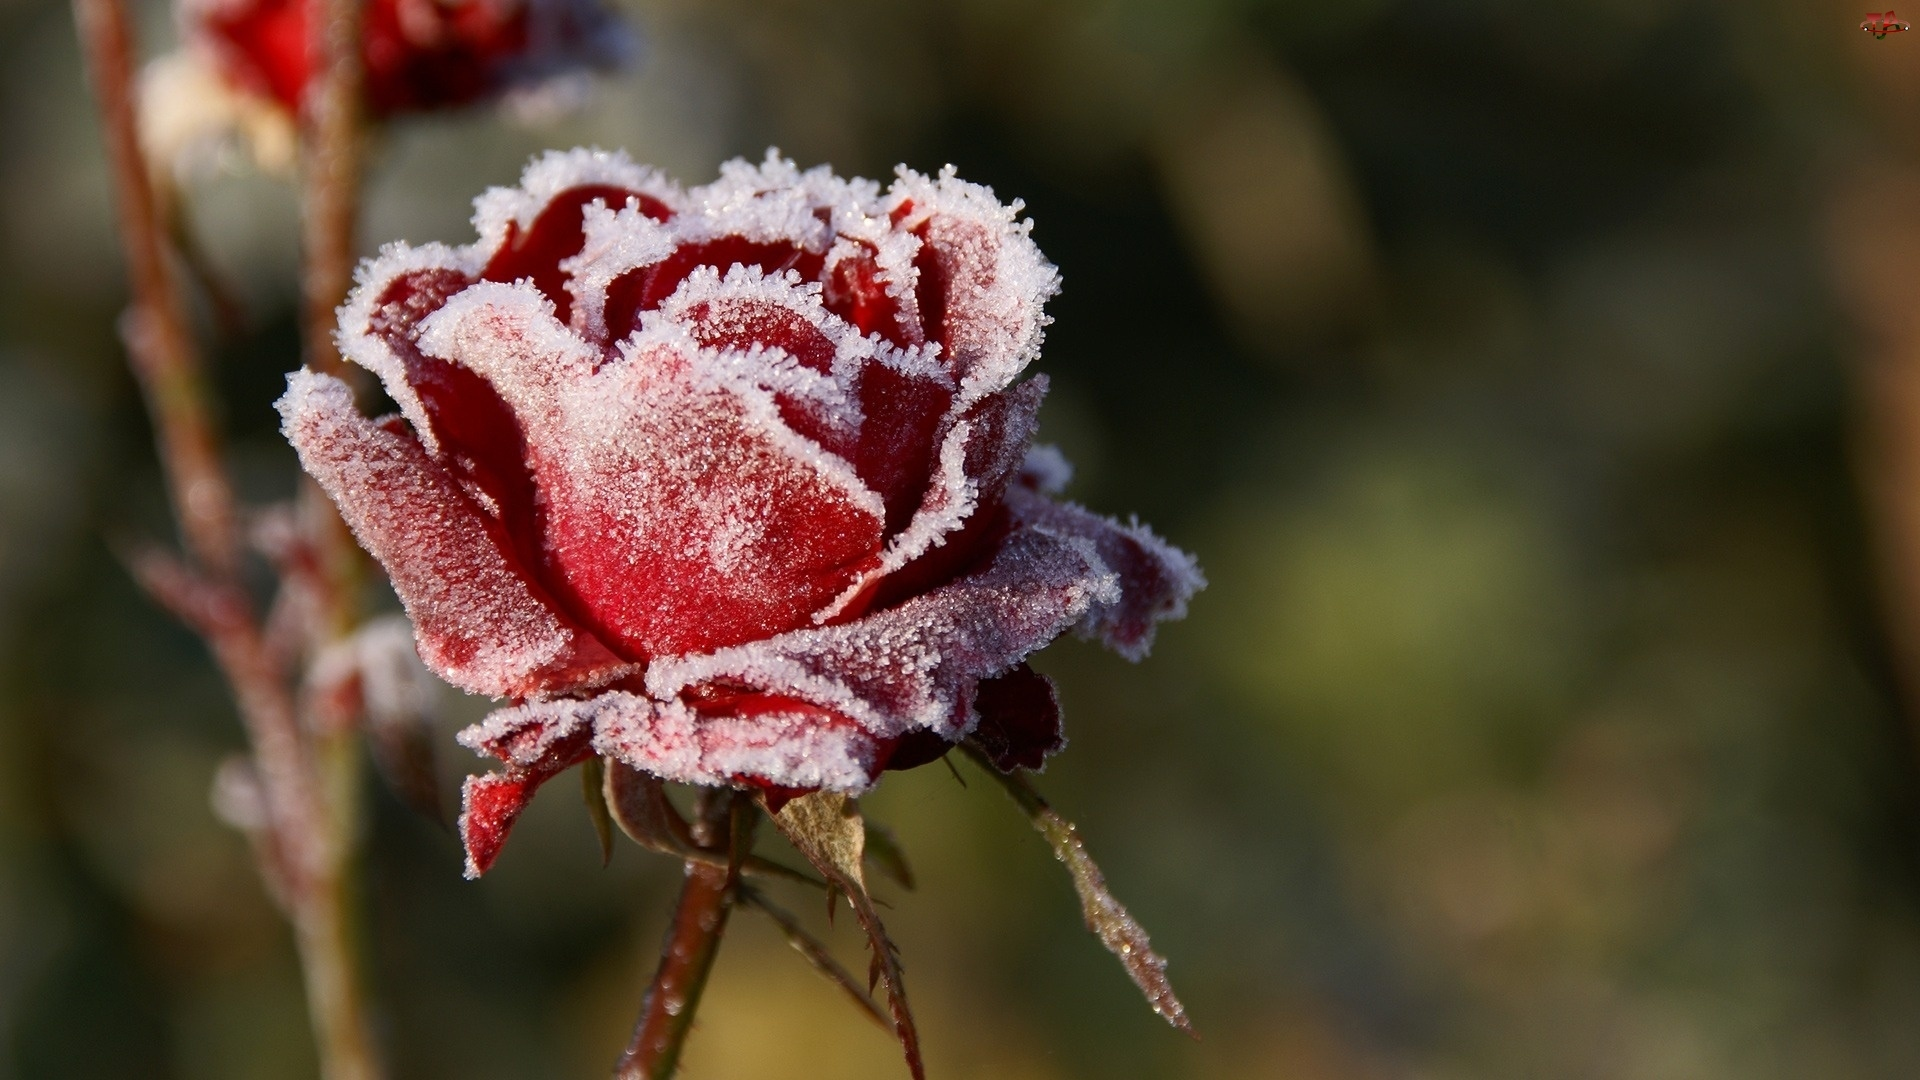 Róża, Mróz, Czerwona, Szron